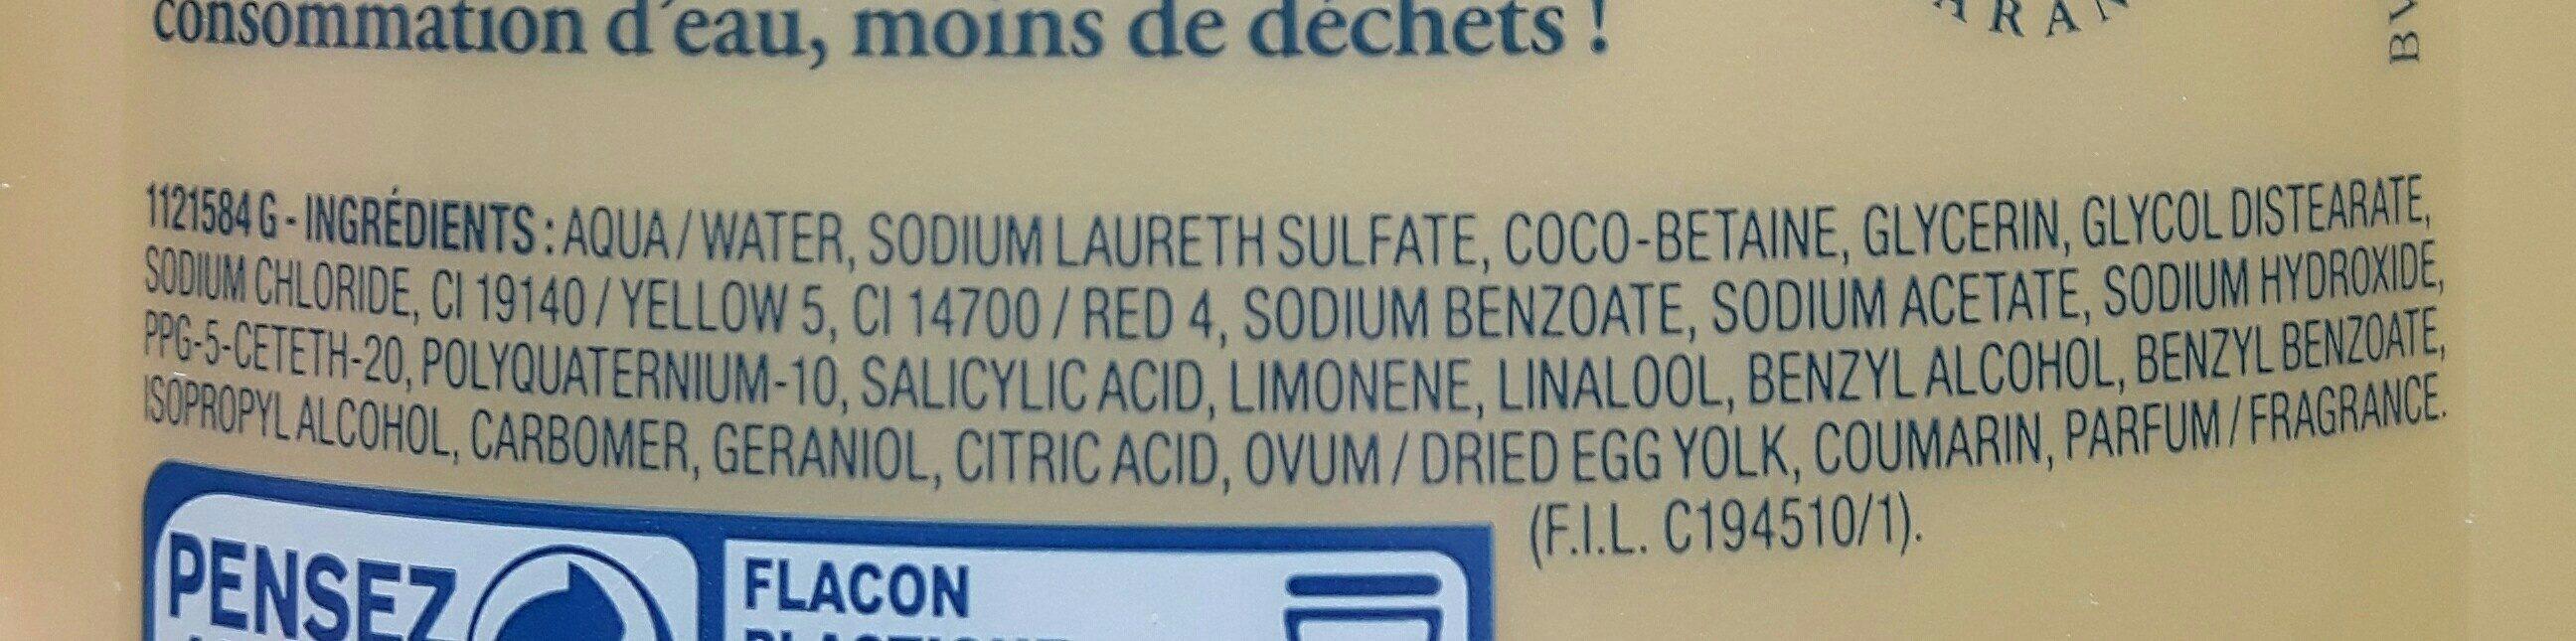 DOP shampooing aux oeufs - Ingrédients - fr